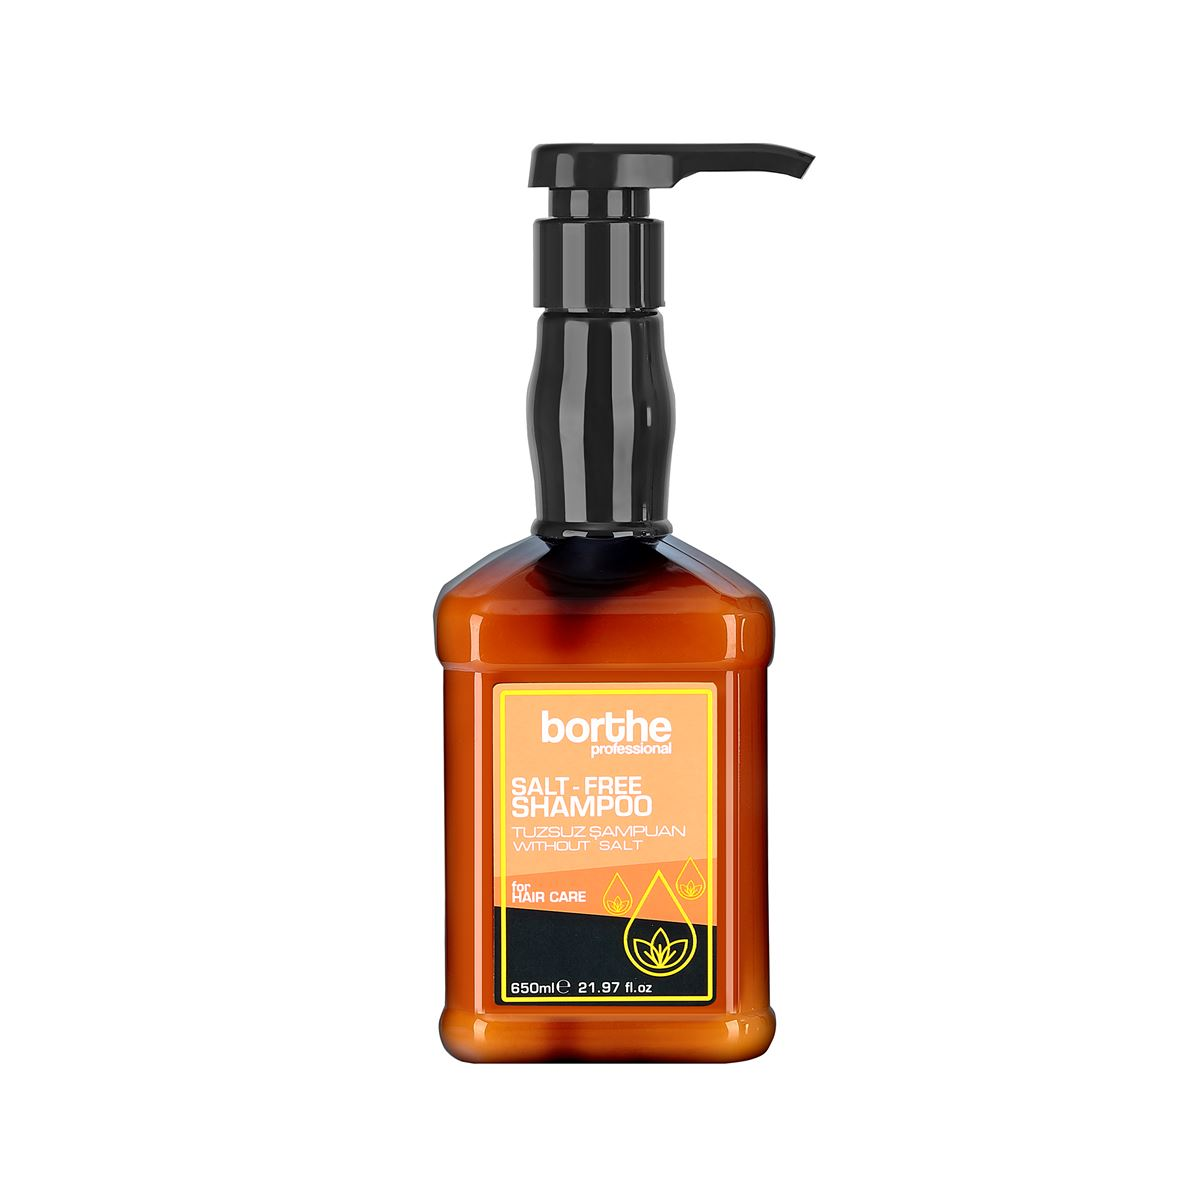 Borthe Salt-Free Shampoo 650 ml.